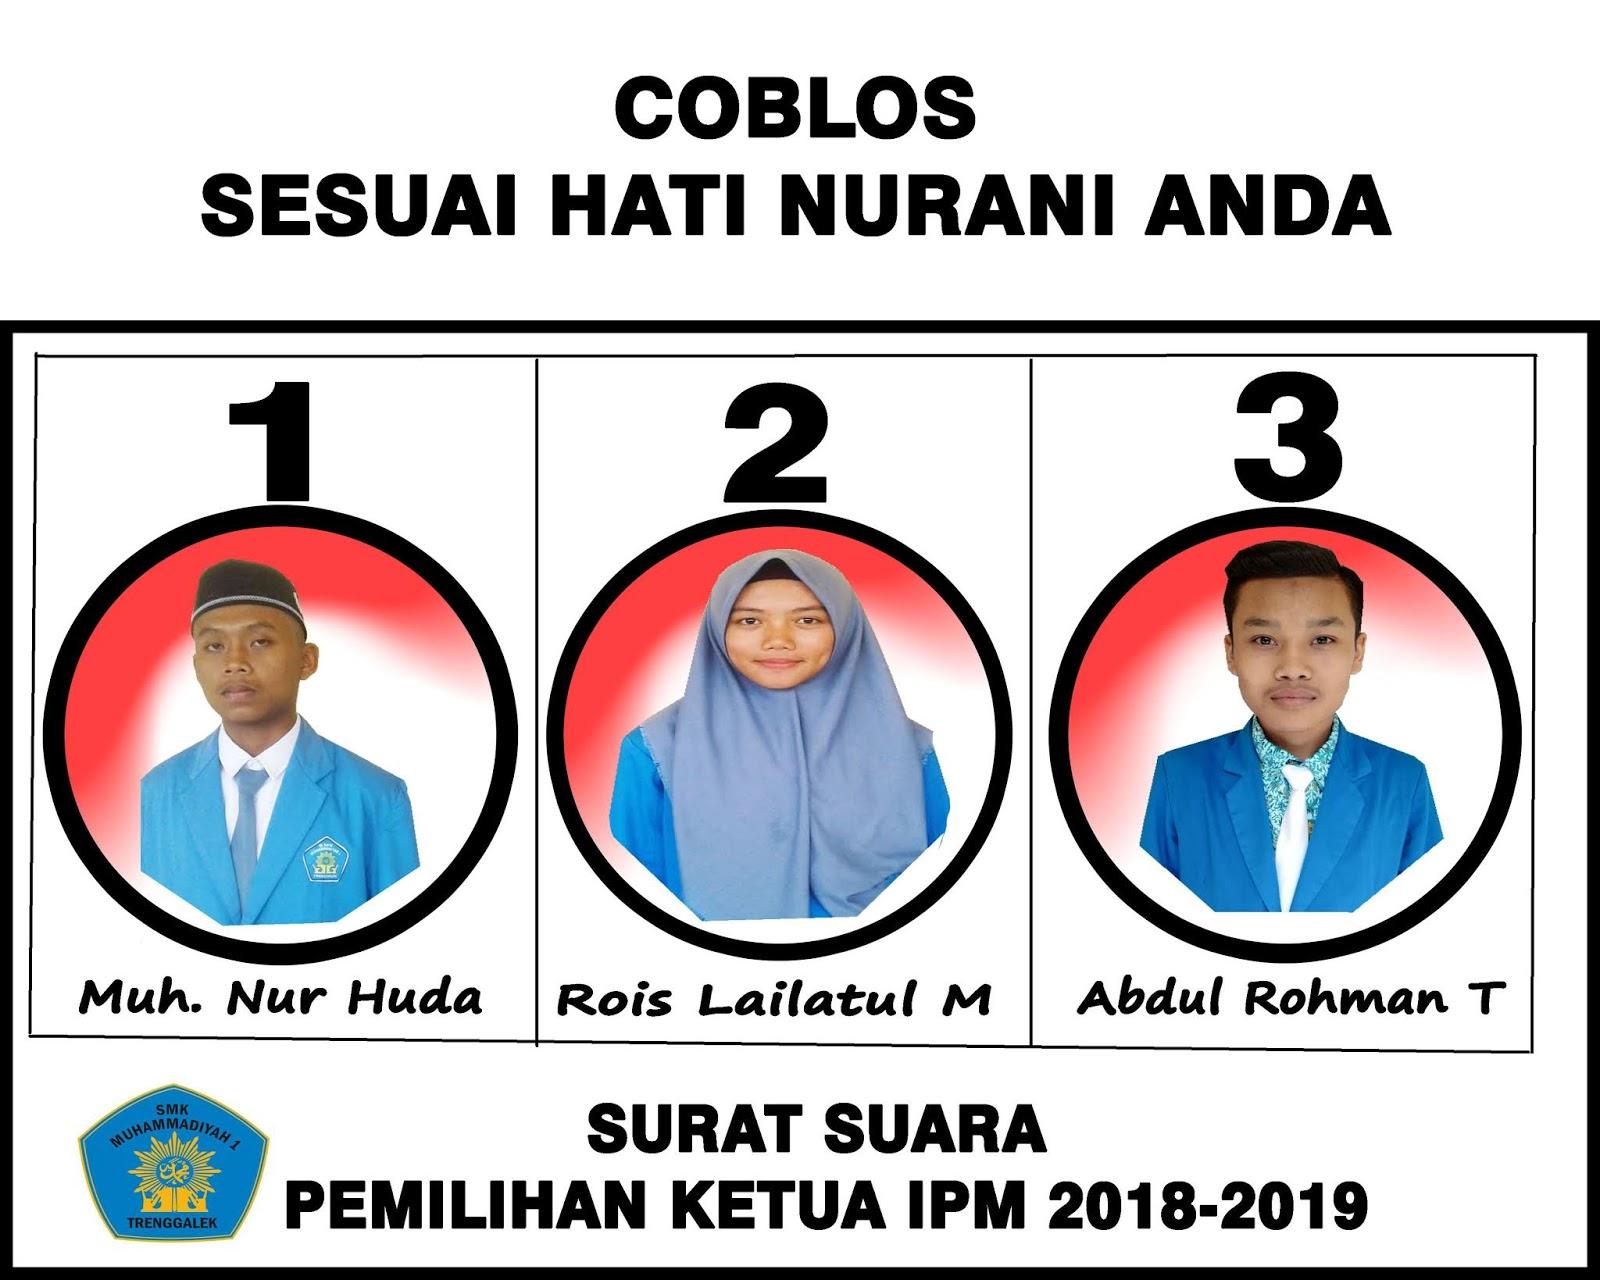 Demokrasi Ala Smk Muhammadiyah 1 Trenggalek I Admin Esemkamucom